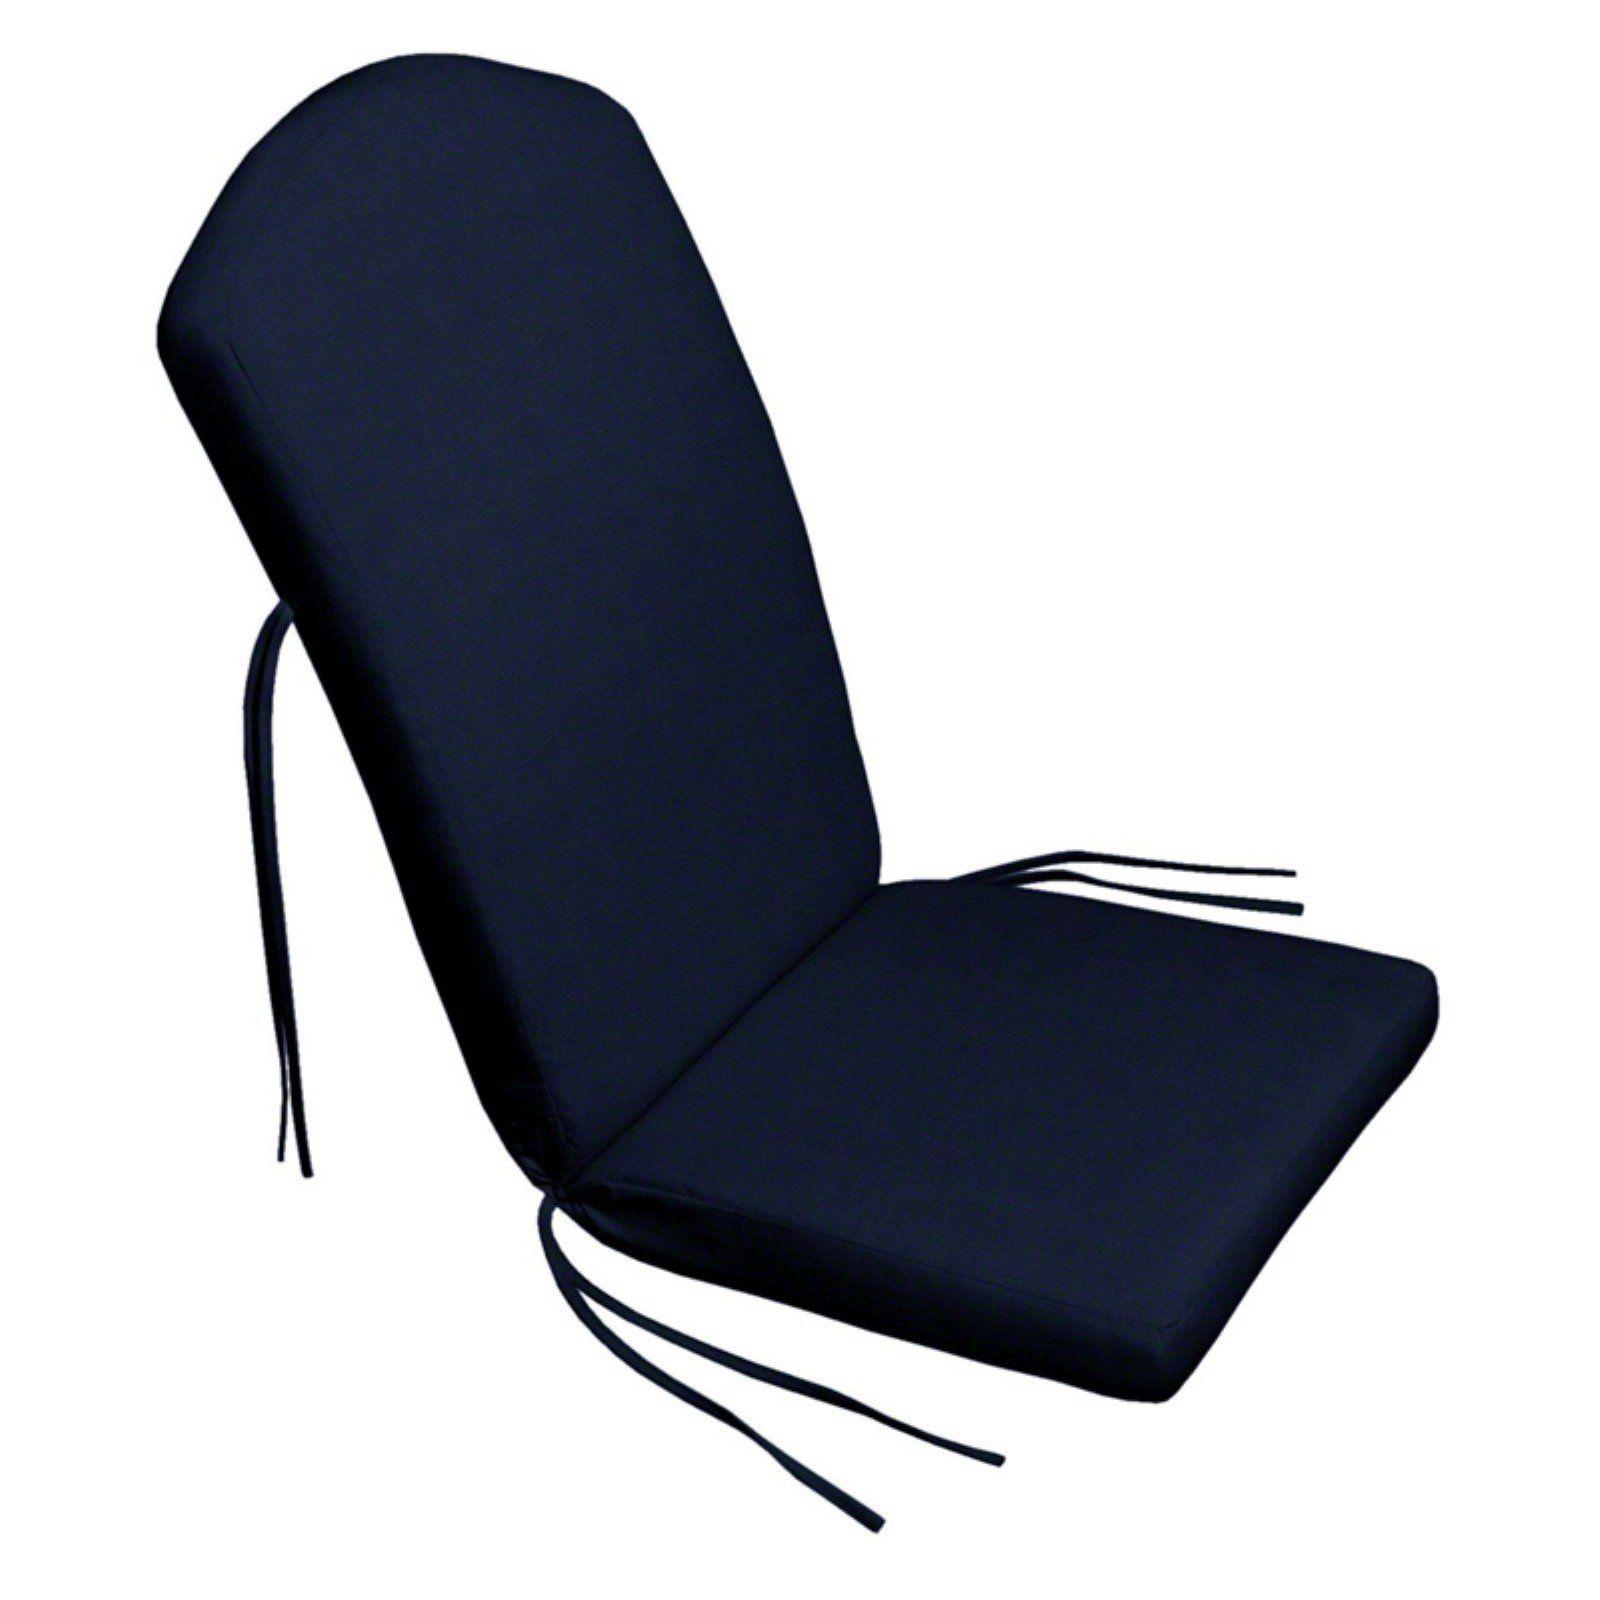 Cushion Source 47 X 21 In Solid Sunbrella Adirondack Chair